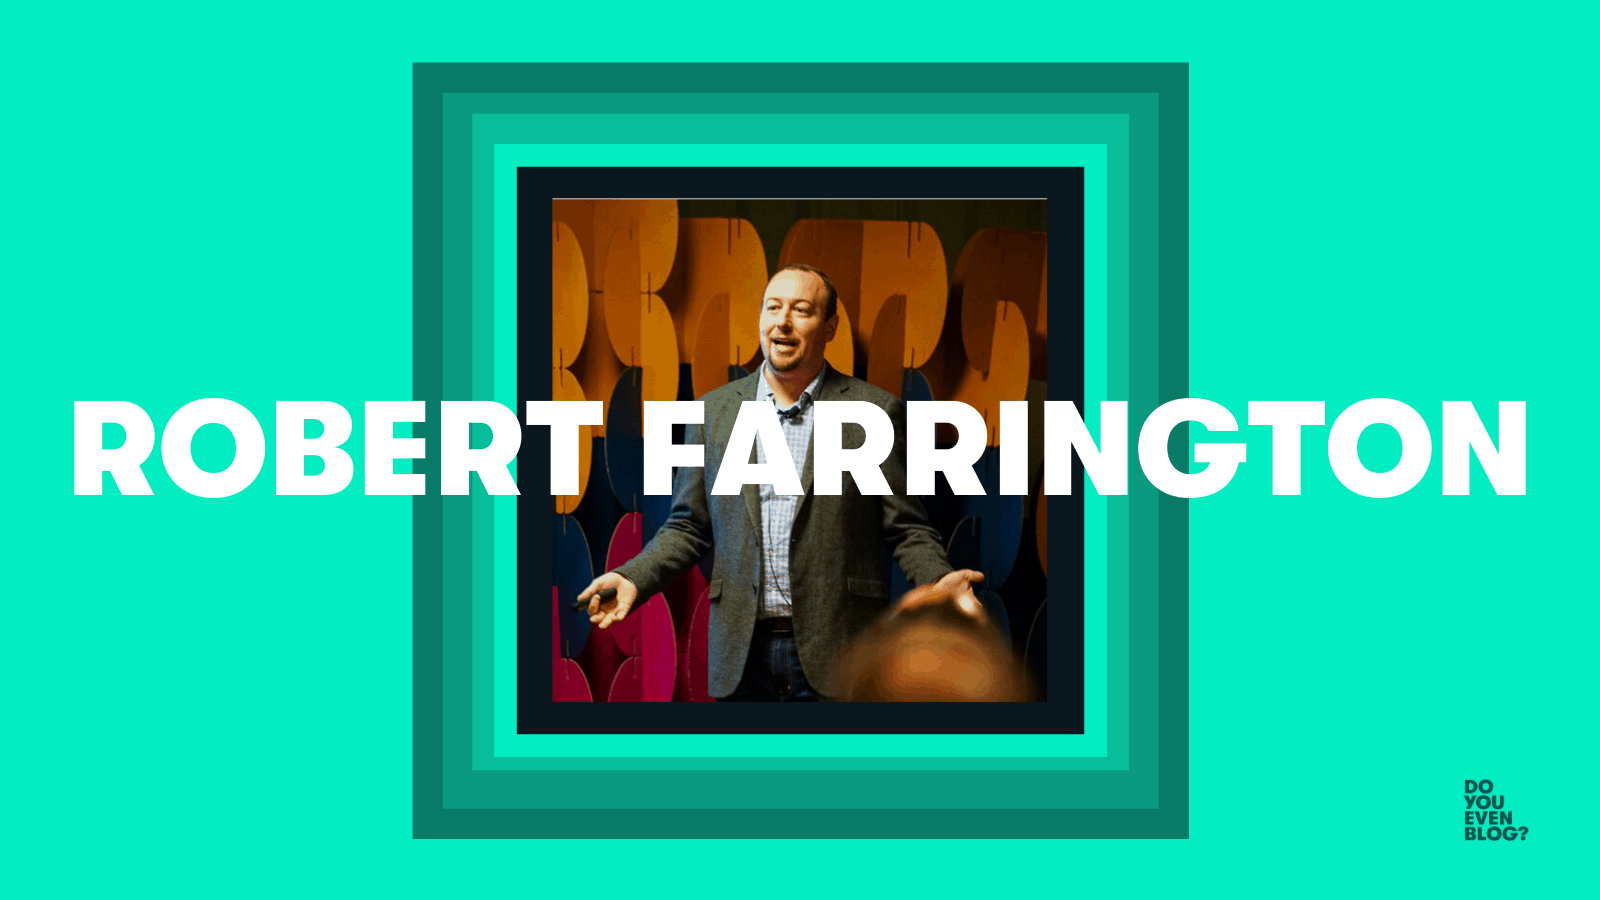 robert farrington